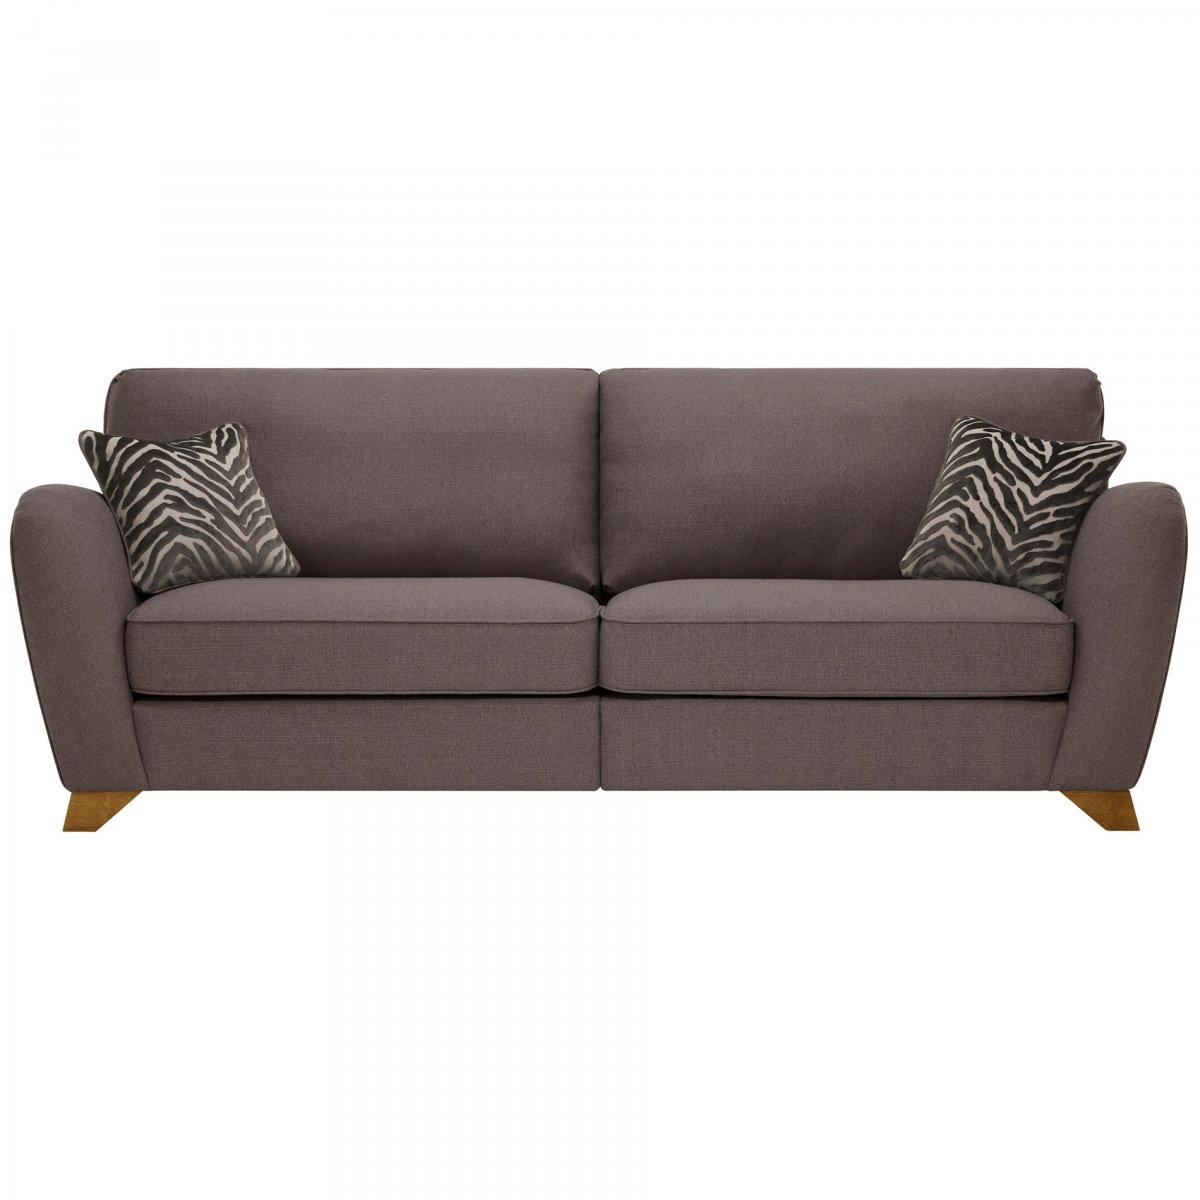 Abbey traditional 4 seat high back sofa oak furniture land for Traditional fabric high back sofas